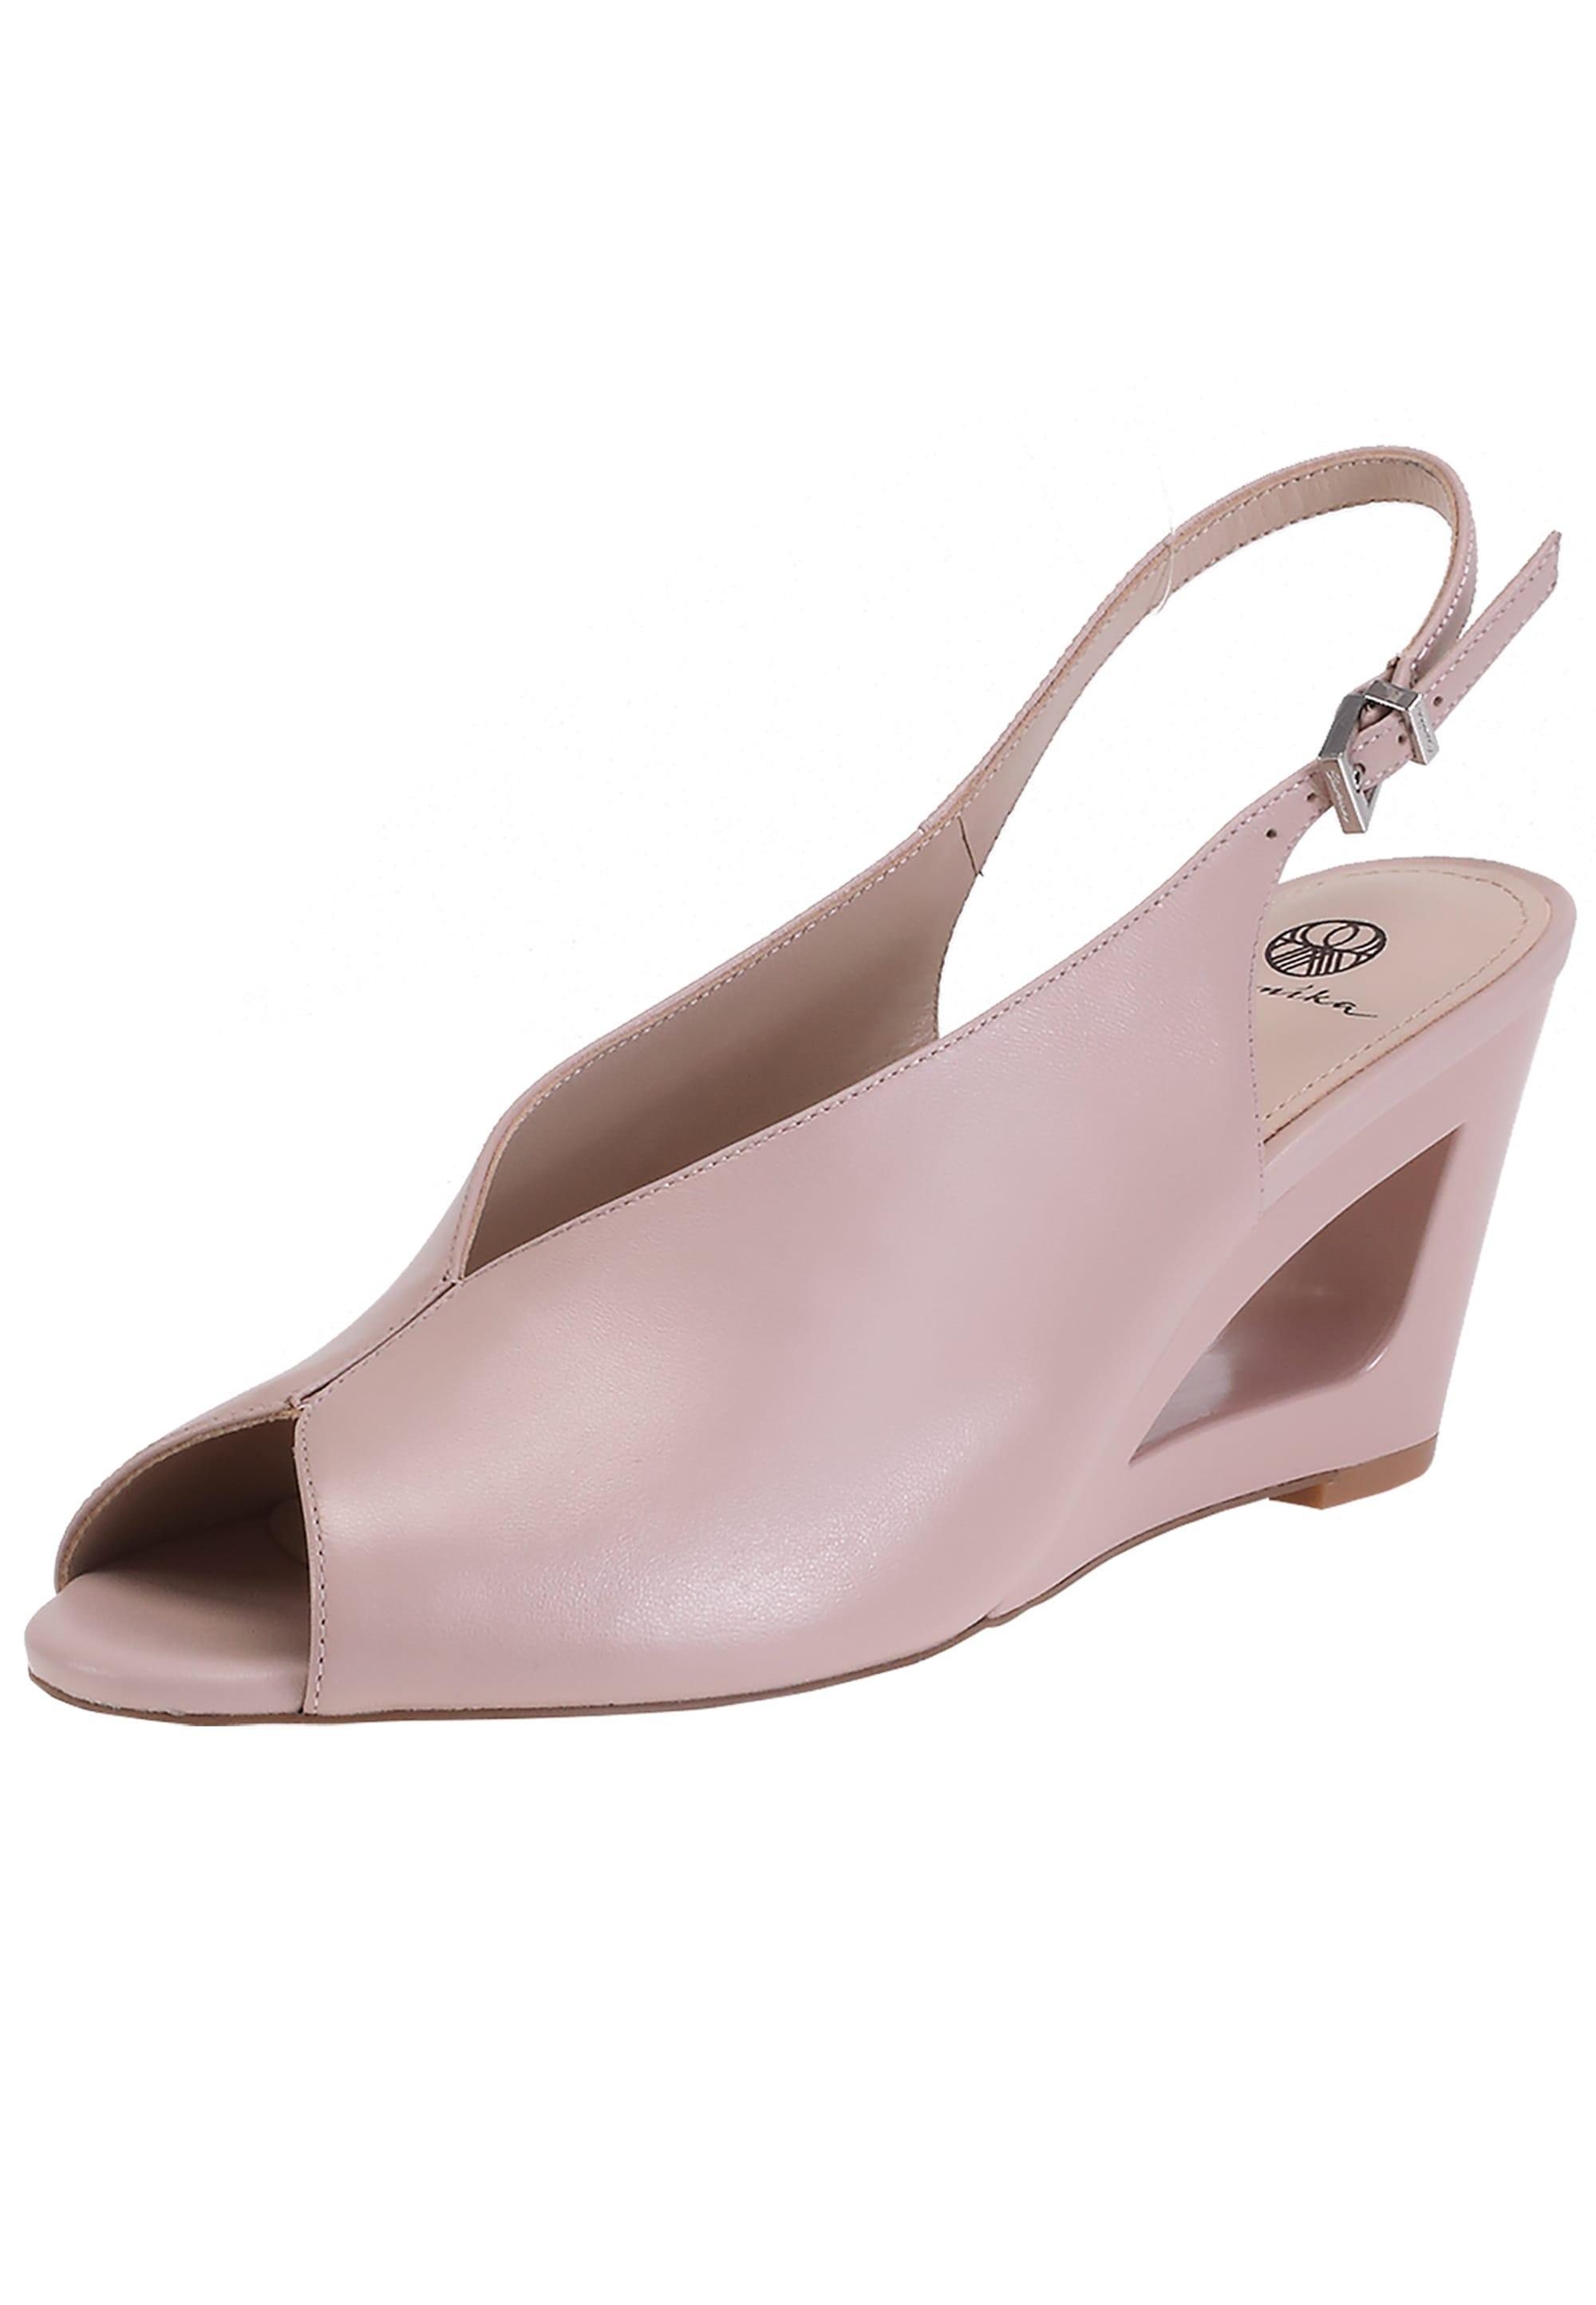 ekonika -  Sandale, aus glattem Leder